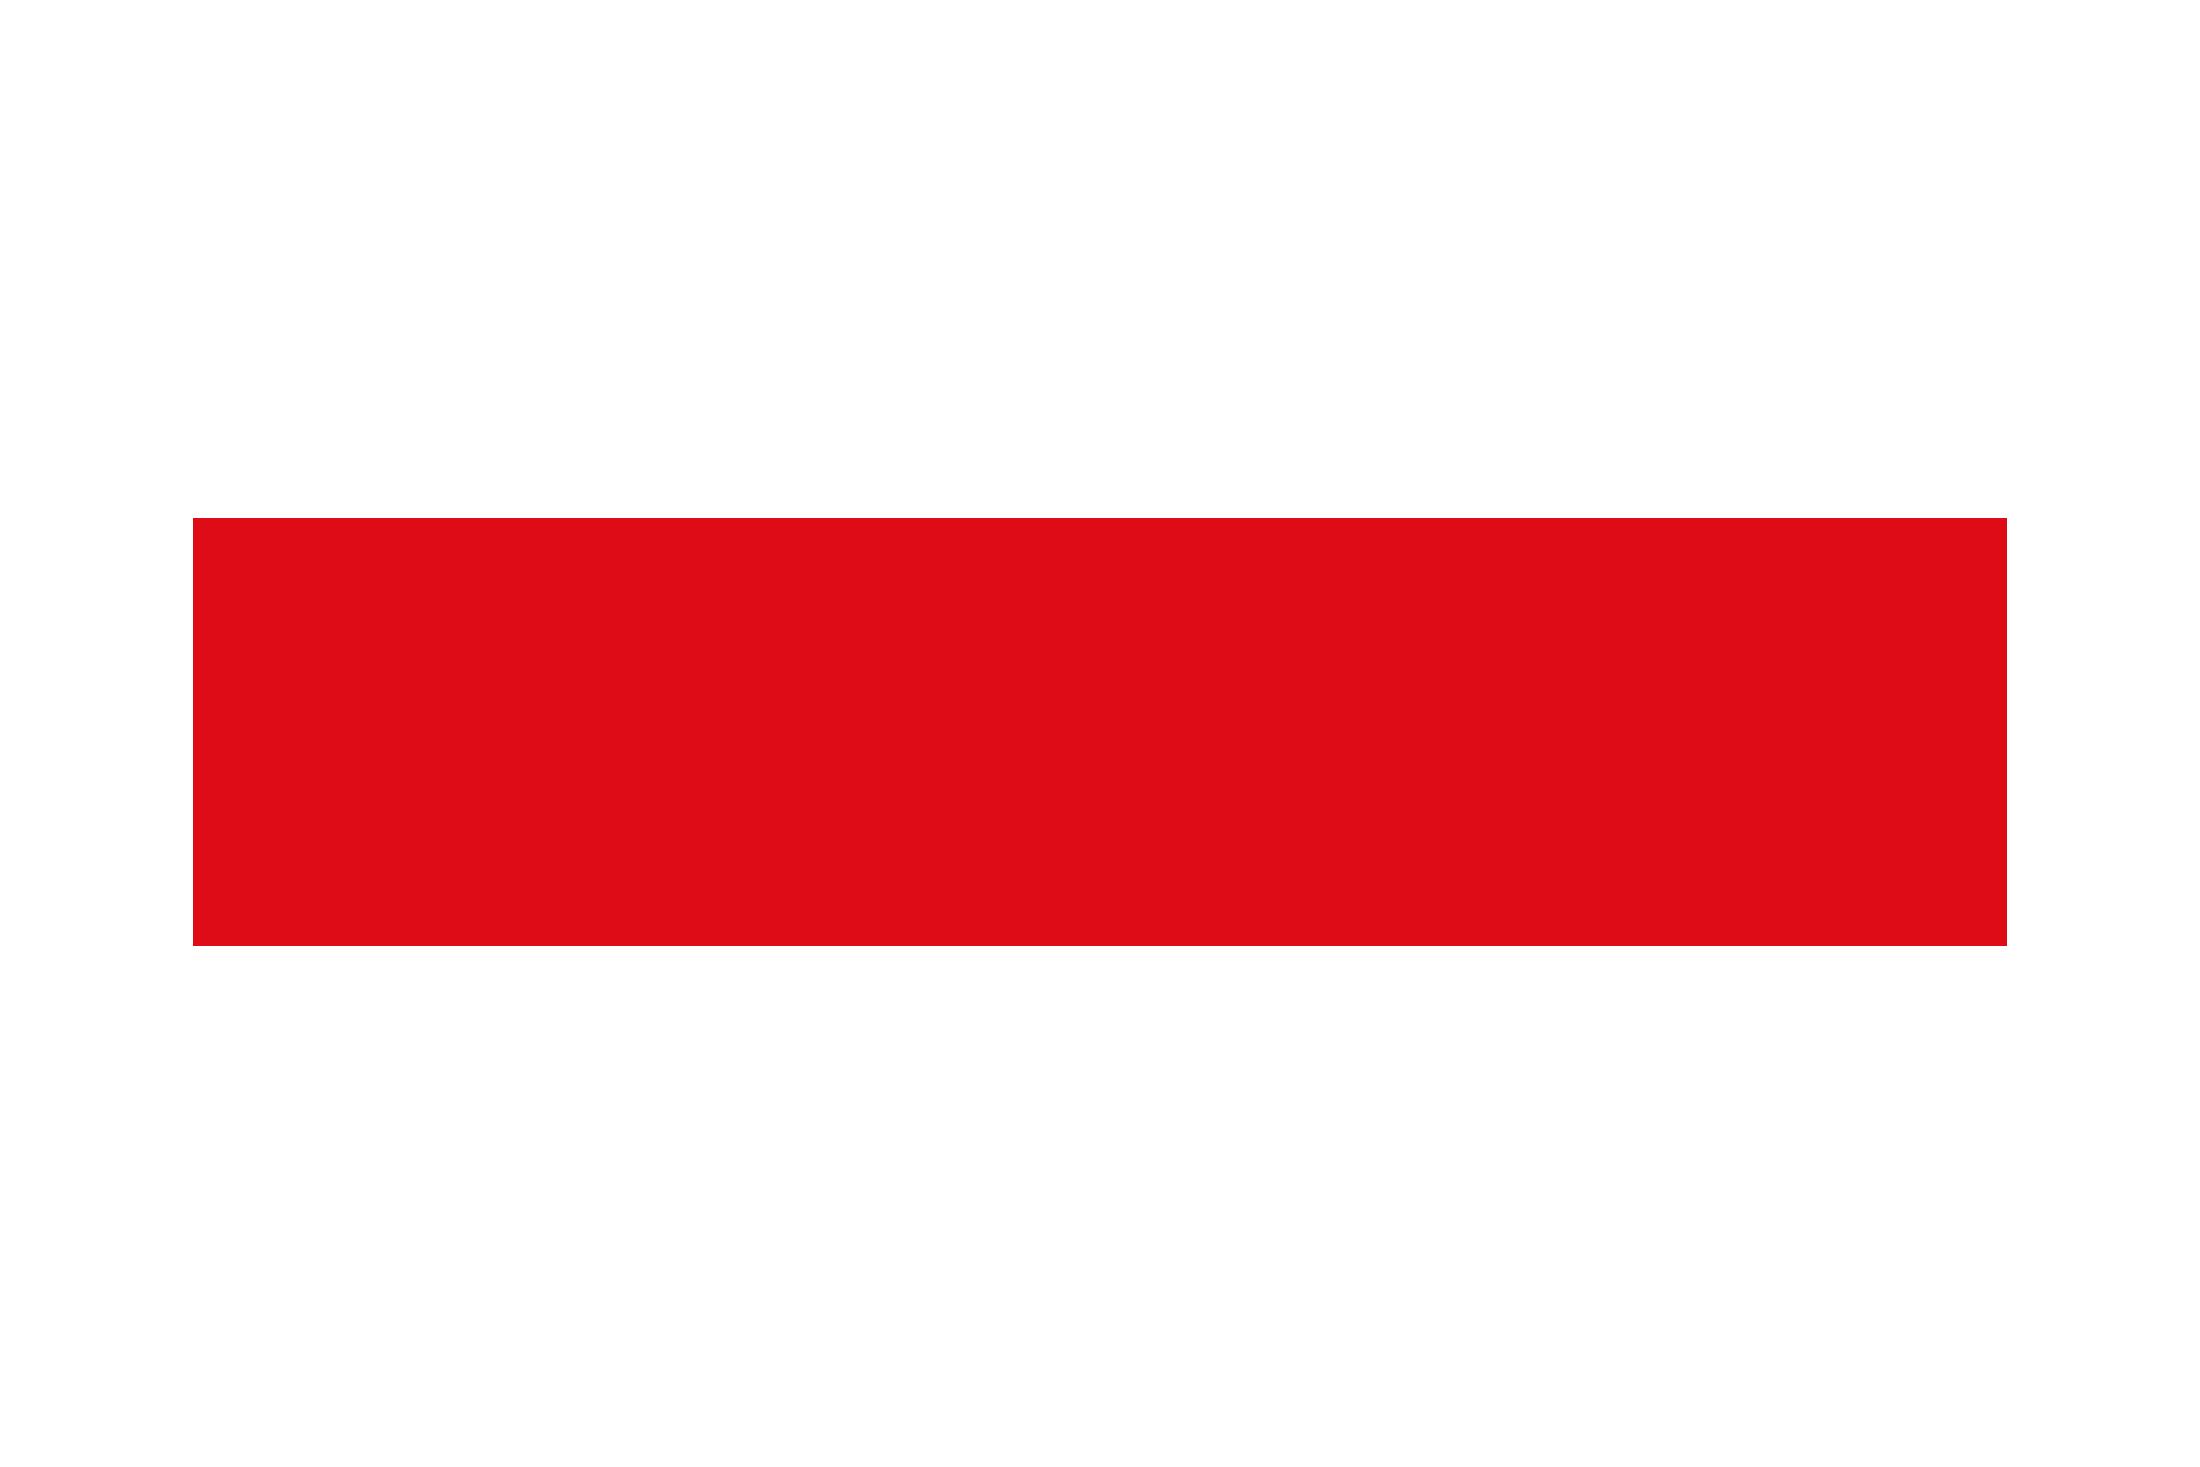 Grunge healthy food label PSD